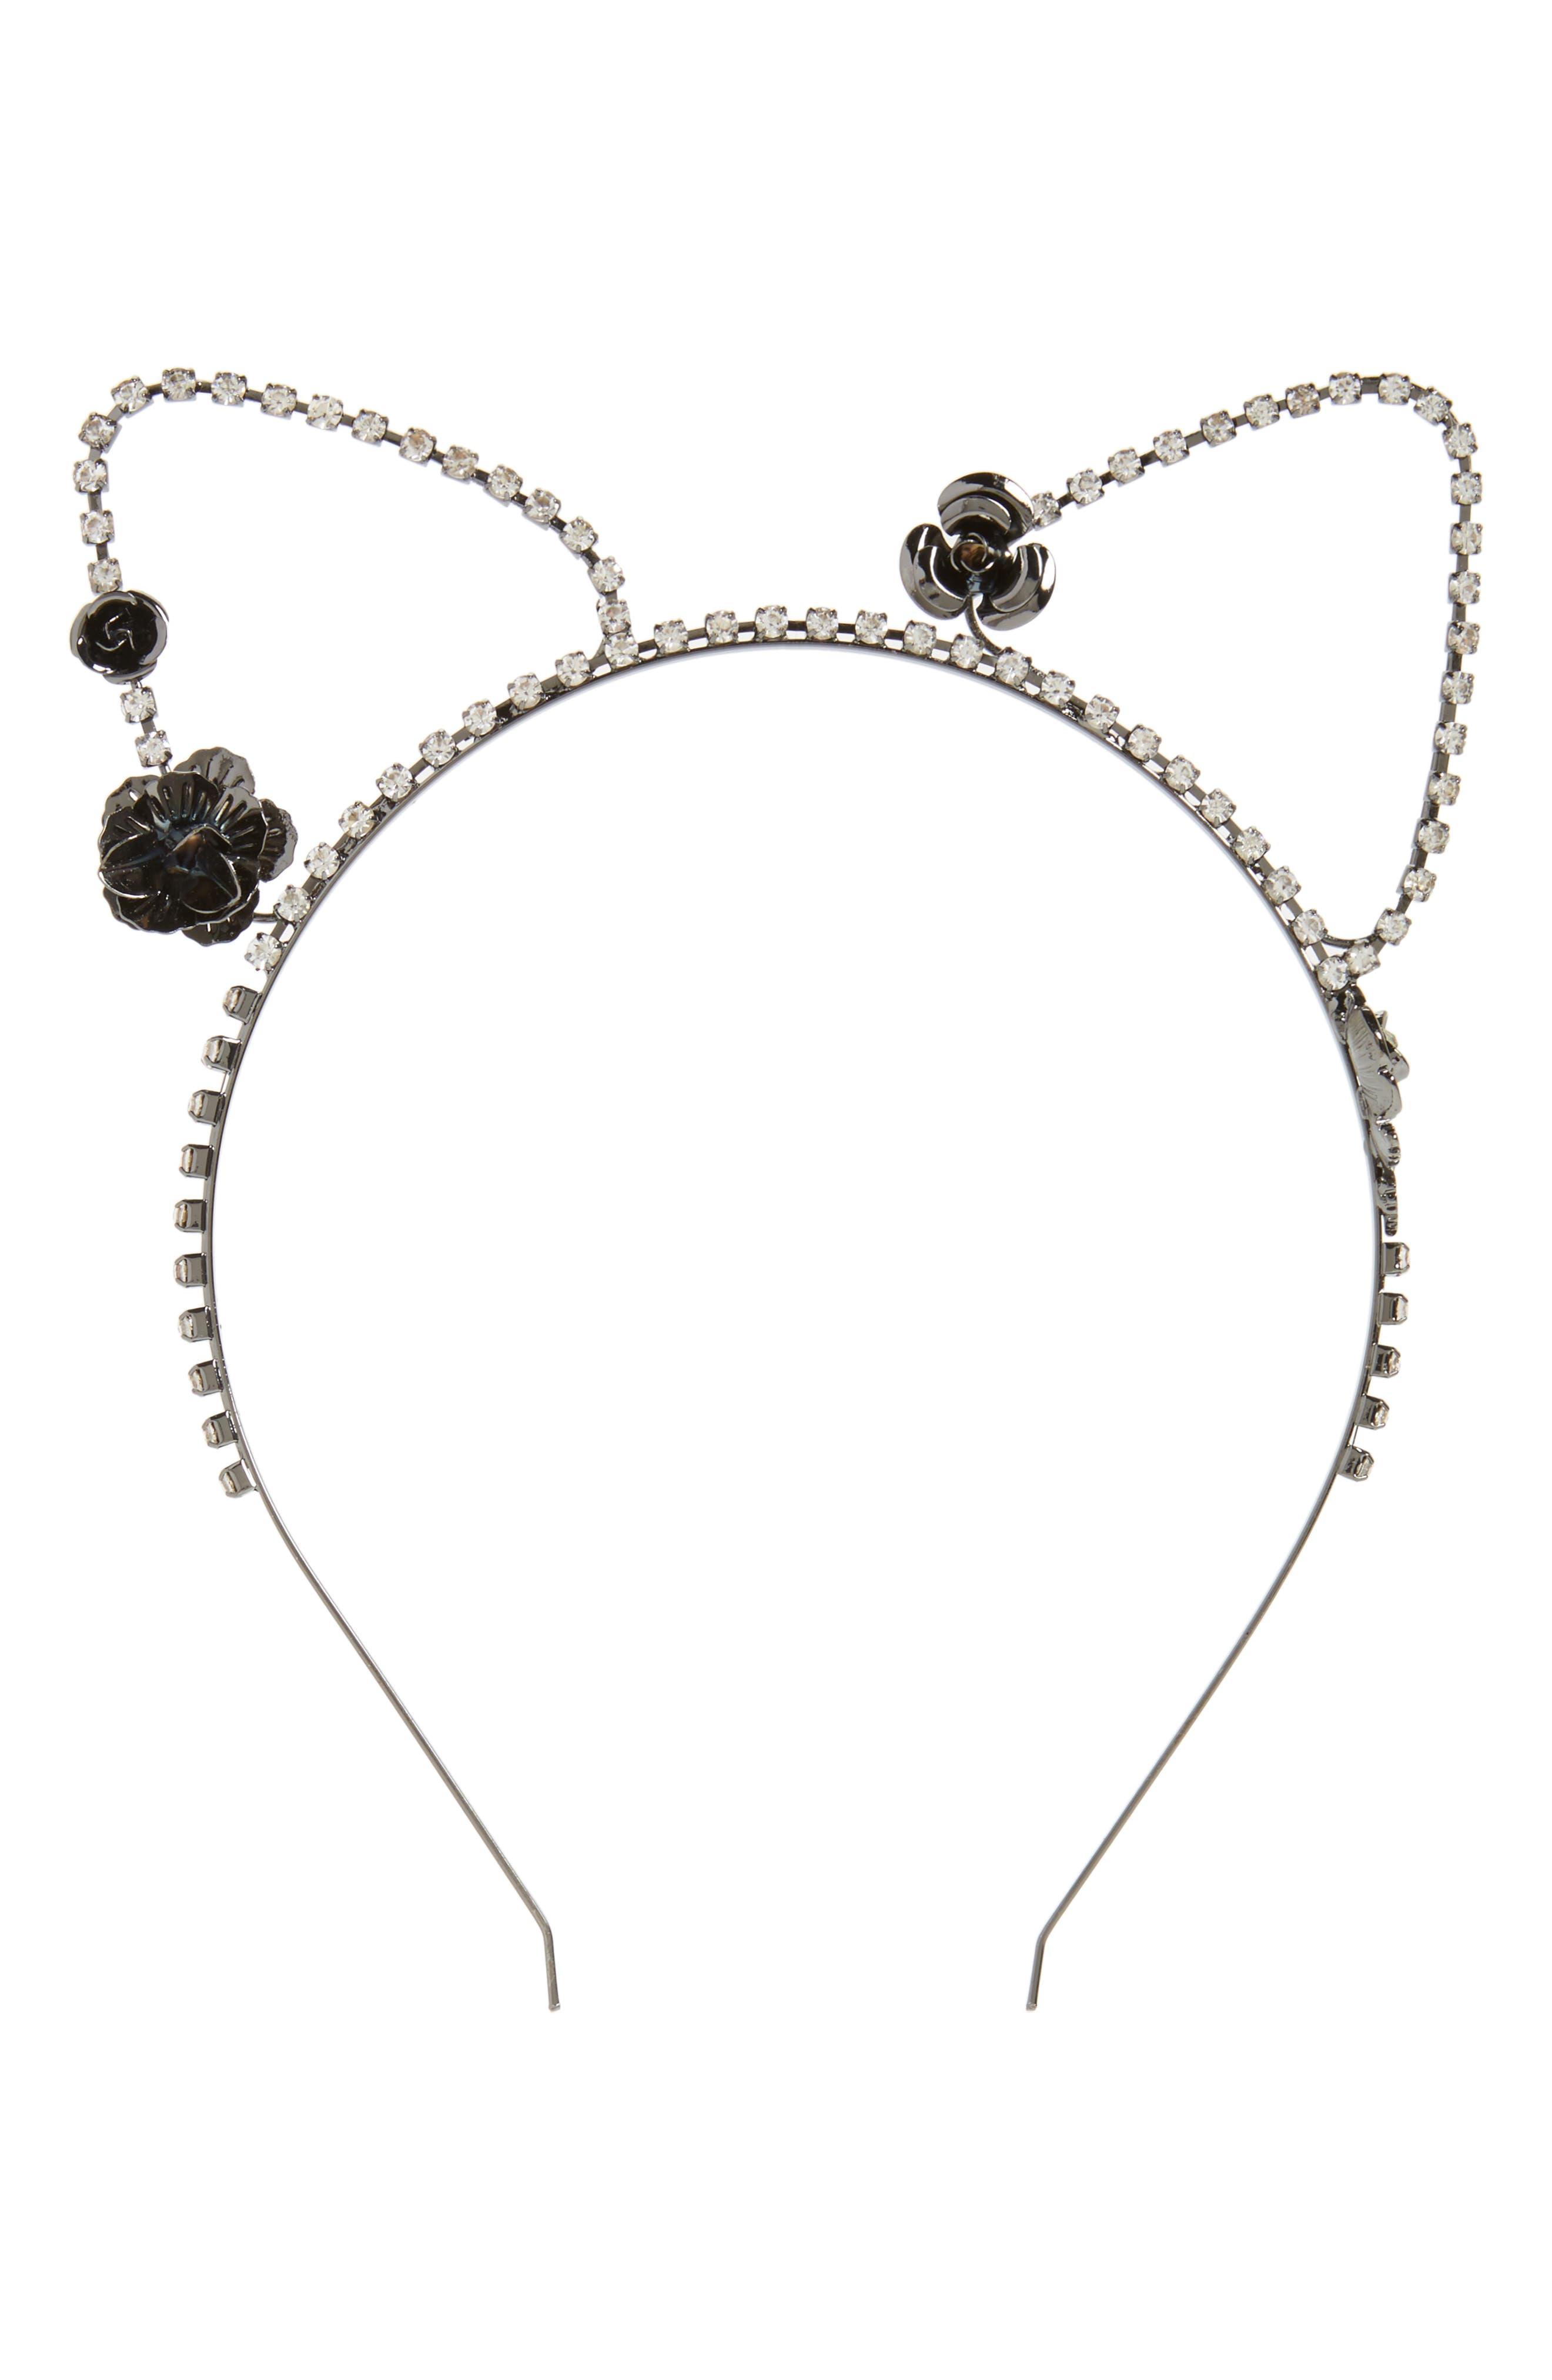 Alternate Image 1 Selected - Berry Cat Ears & Roses Headband